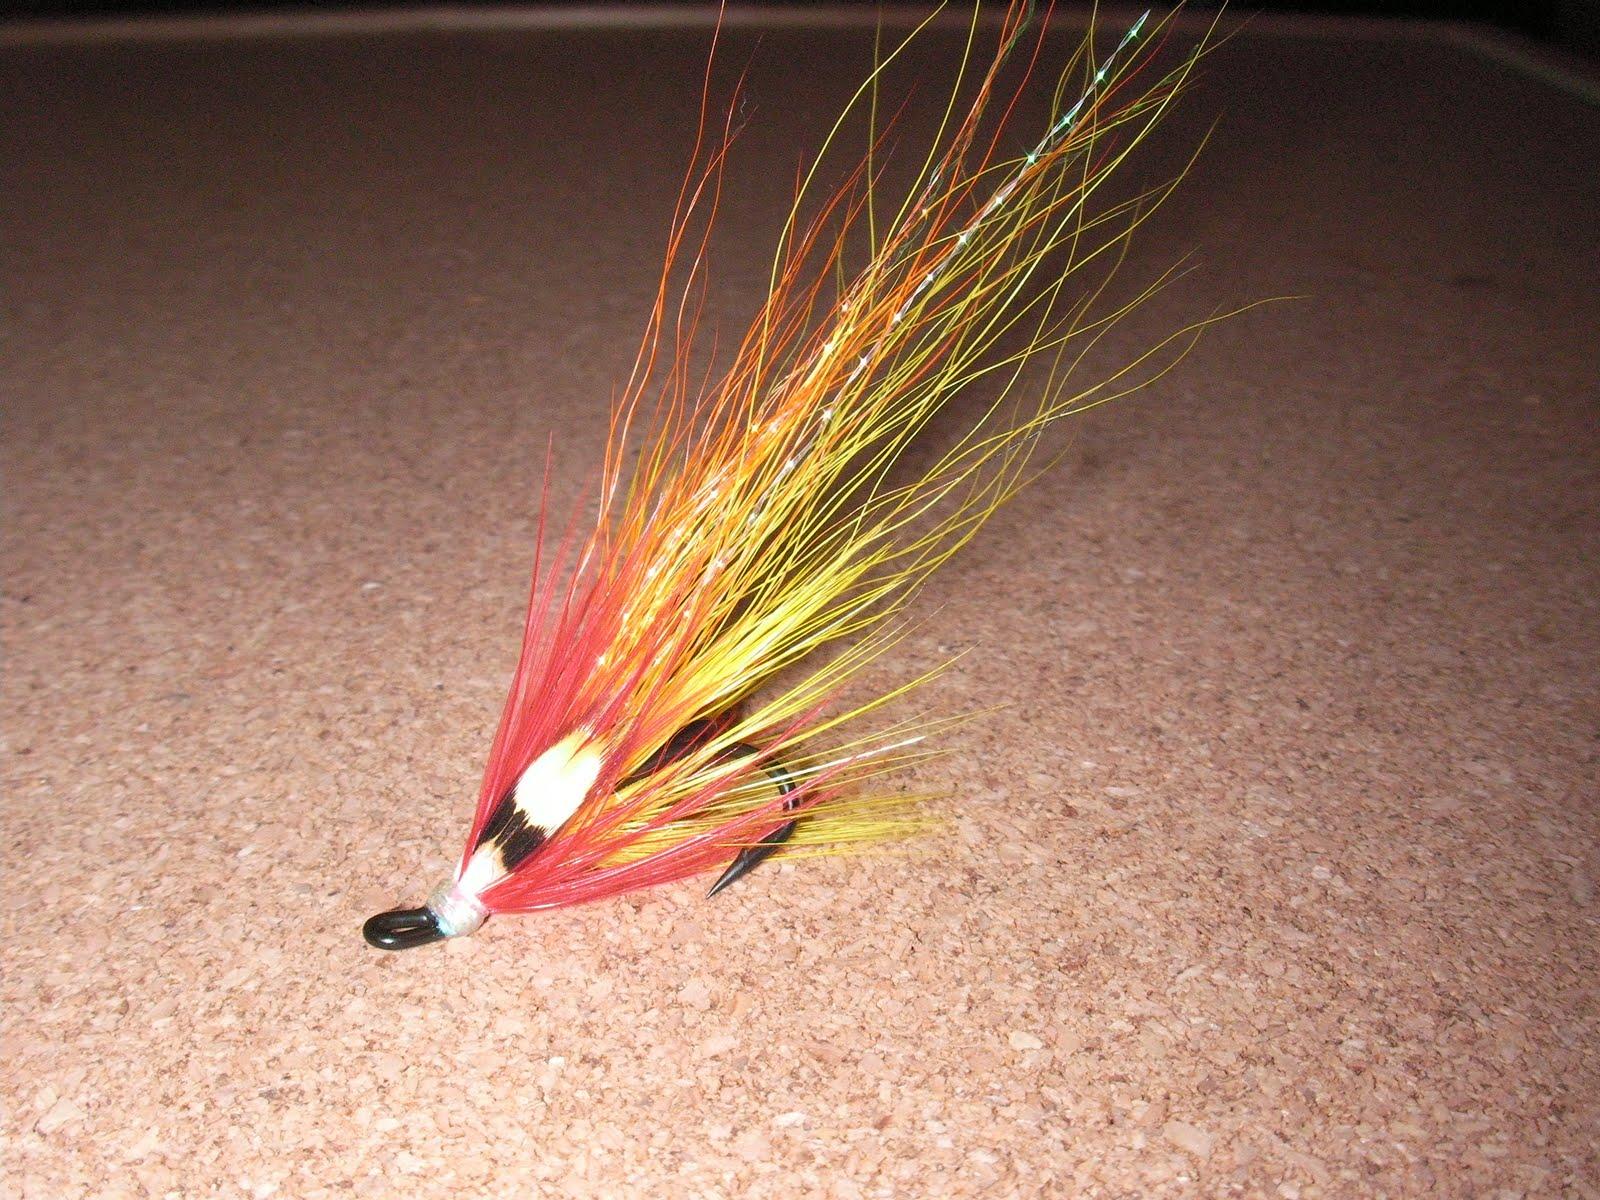 Salmon fly flamethrower salmon flies for Salon fly